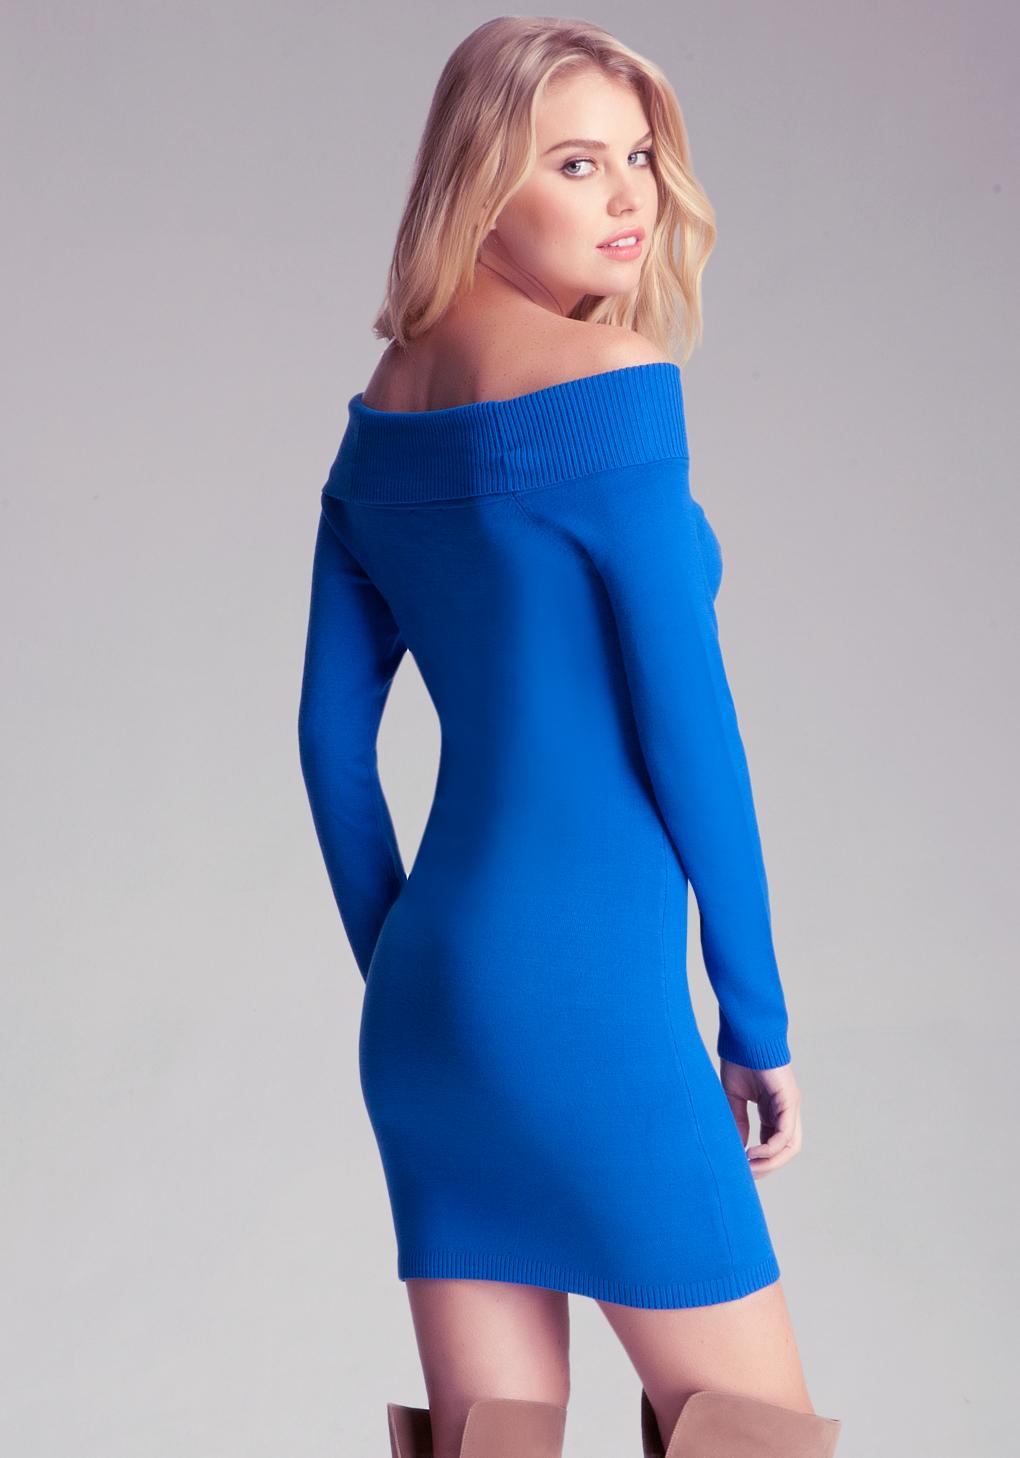 Bebe Off Shoulder Sweater Dress in Blue | Lyst